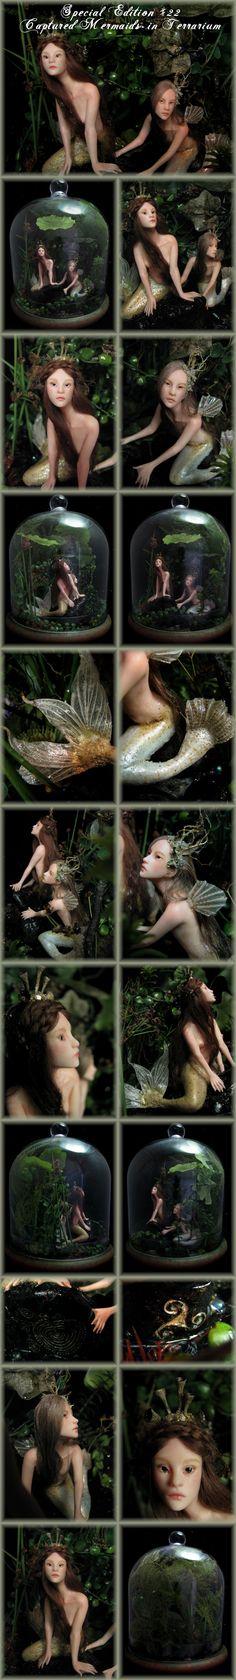 Nenúfar Blanco ~ SE#22 Captured Mermaids in Terrarium